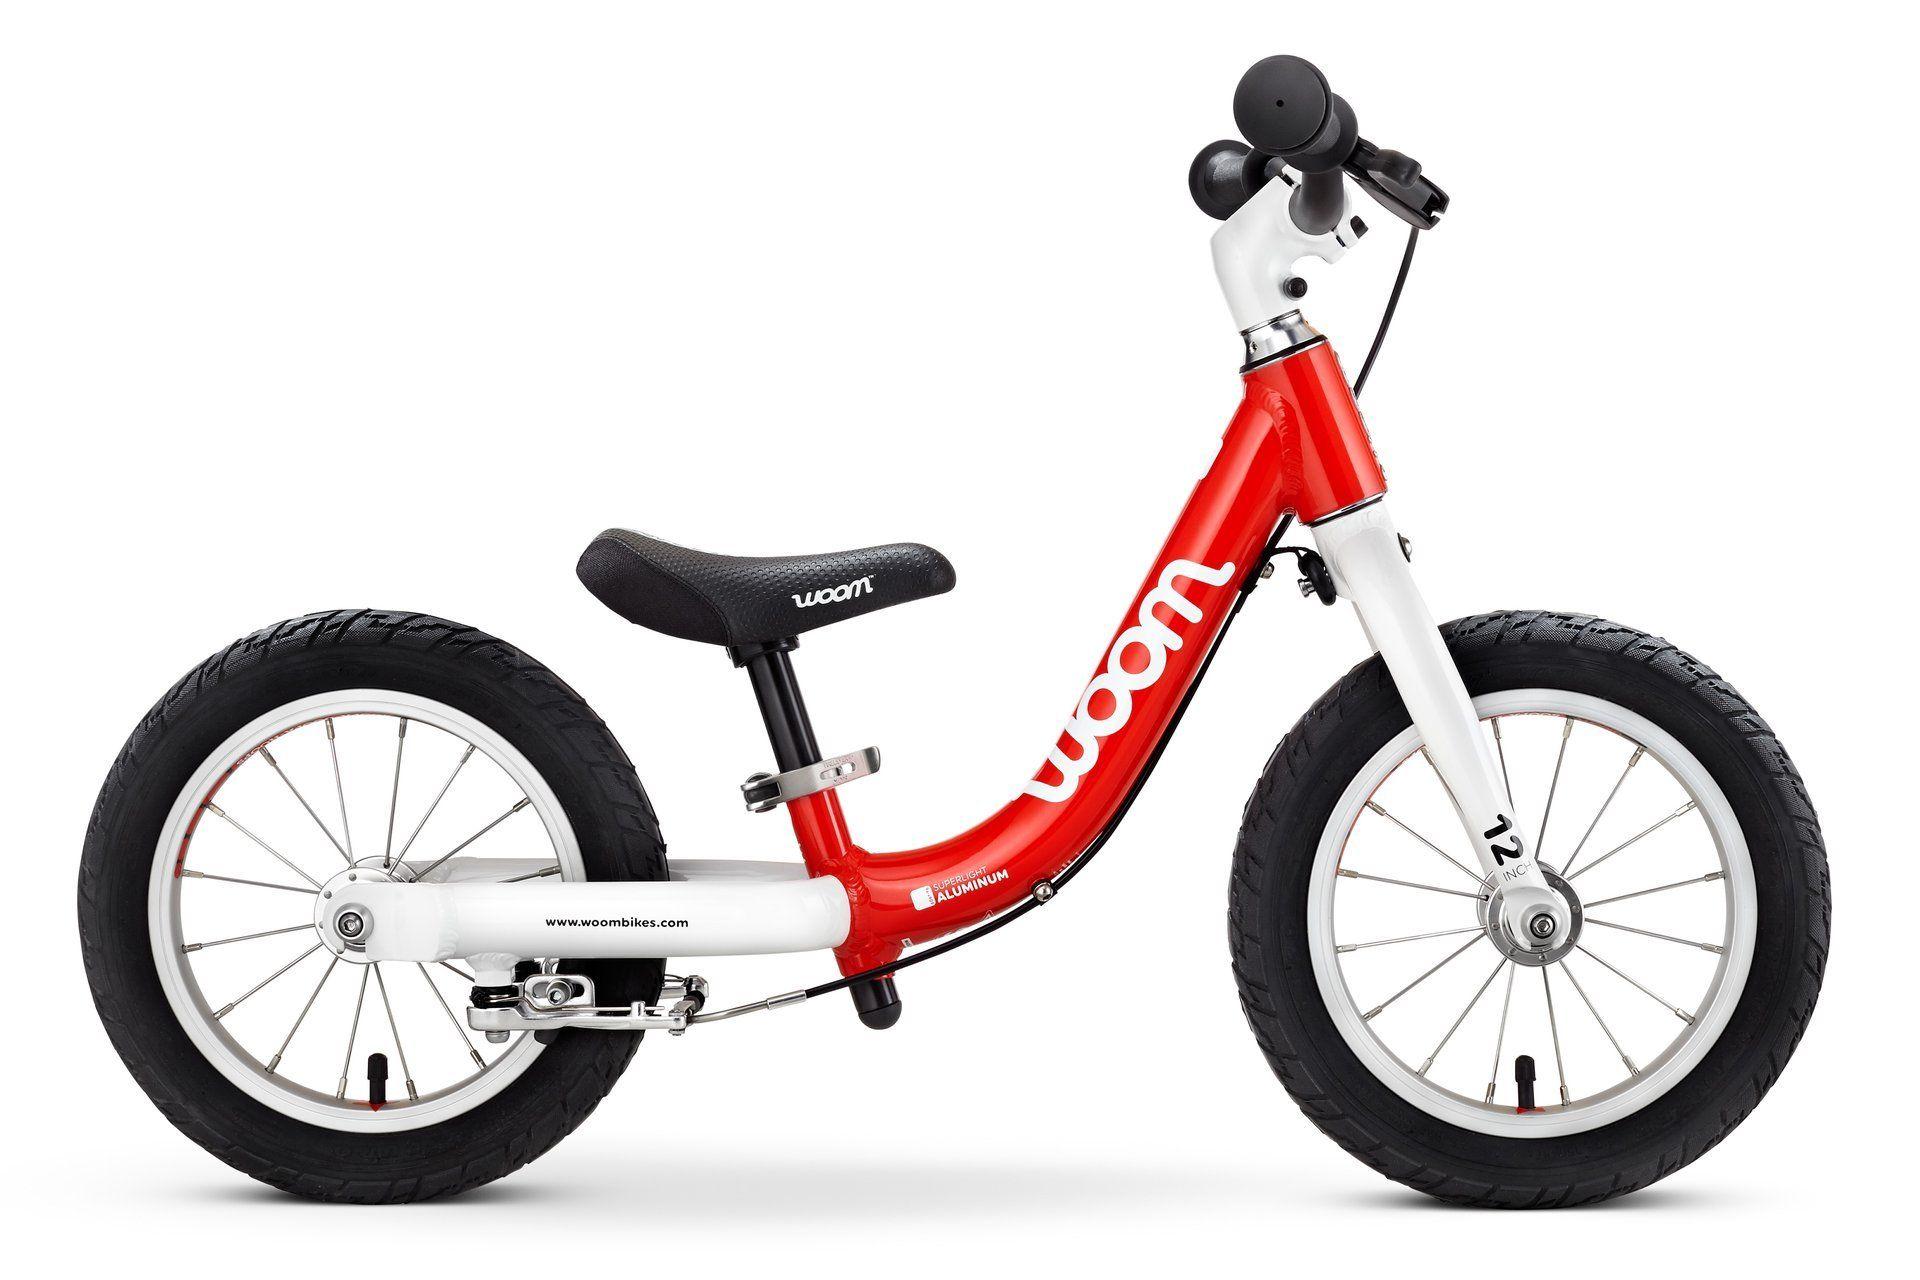 Woom 1 12 Balance bike, Bike, Bicycle